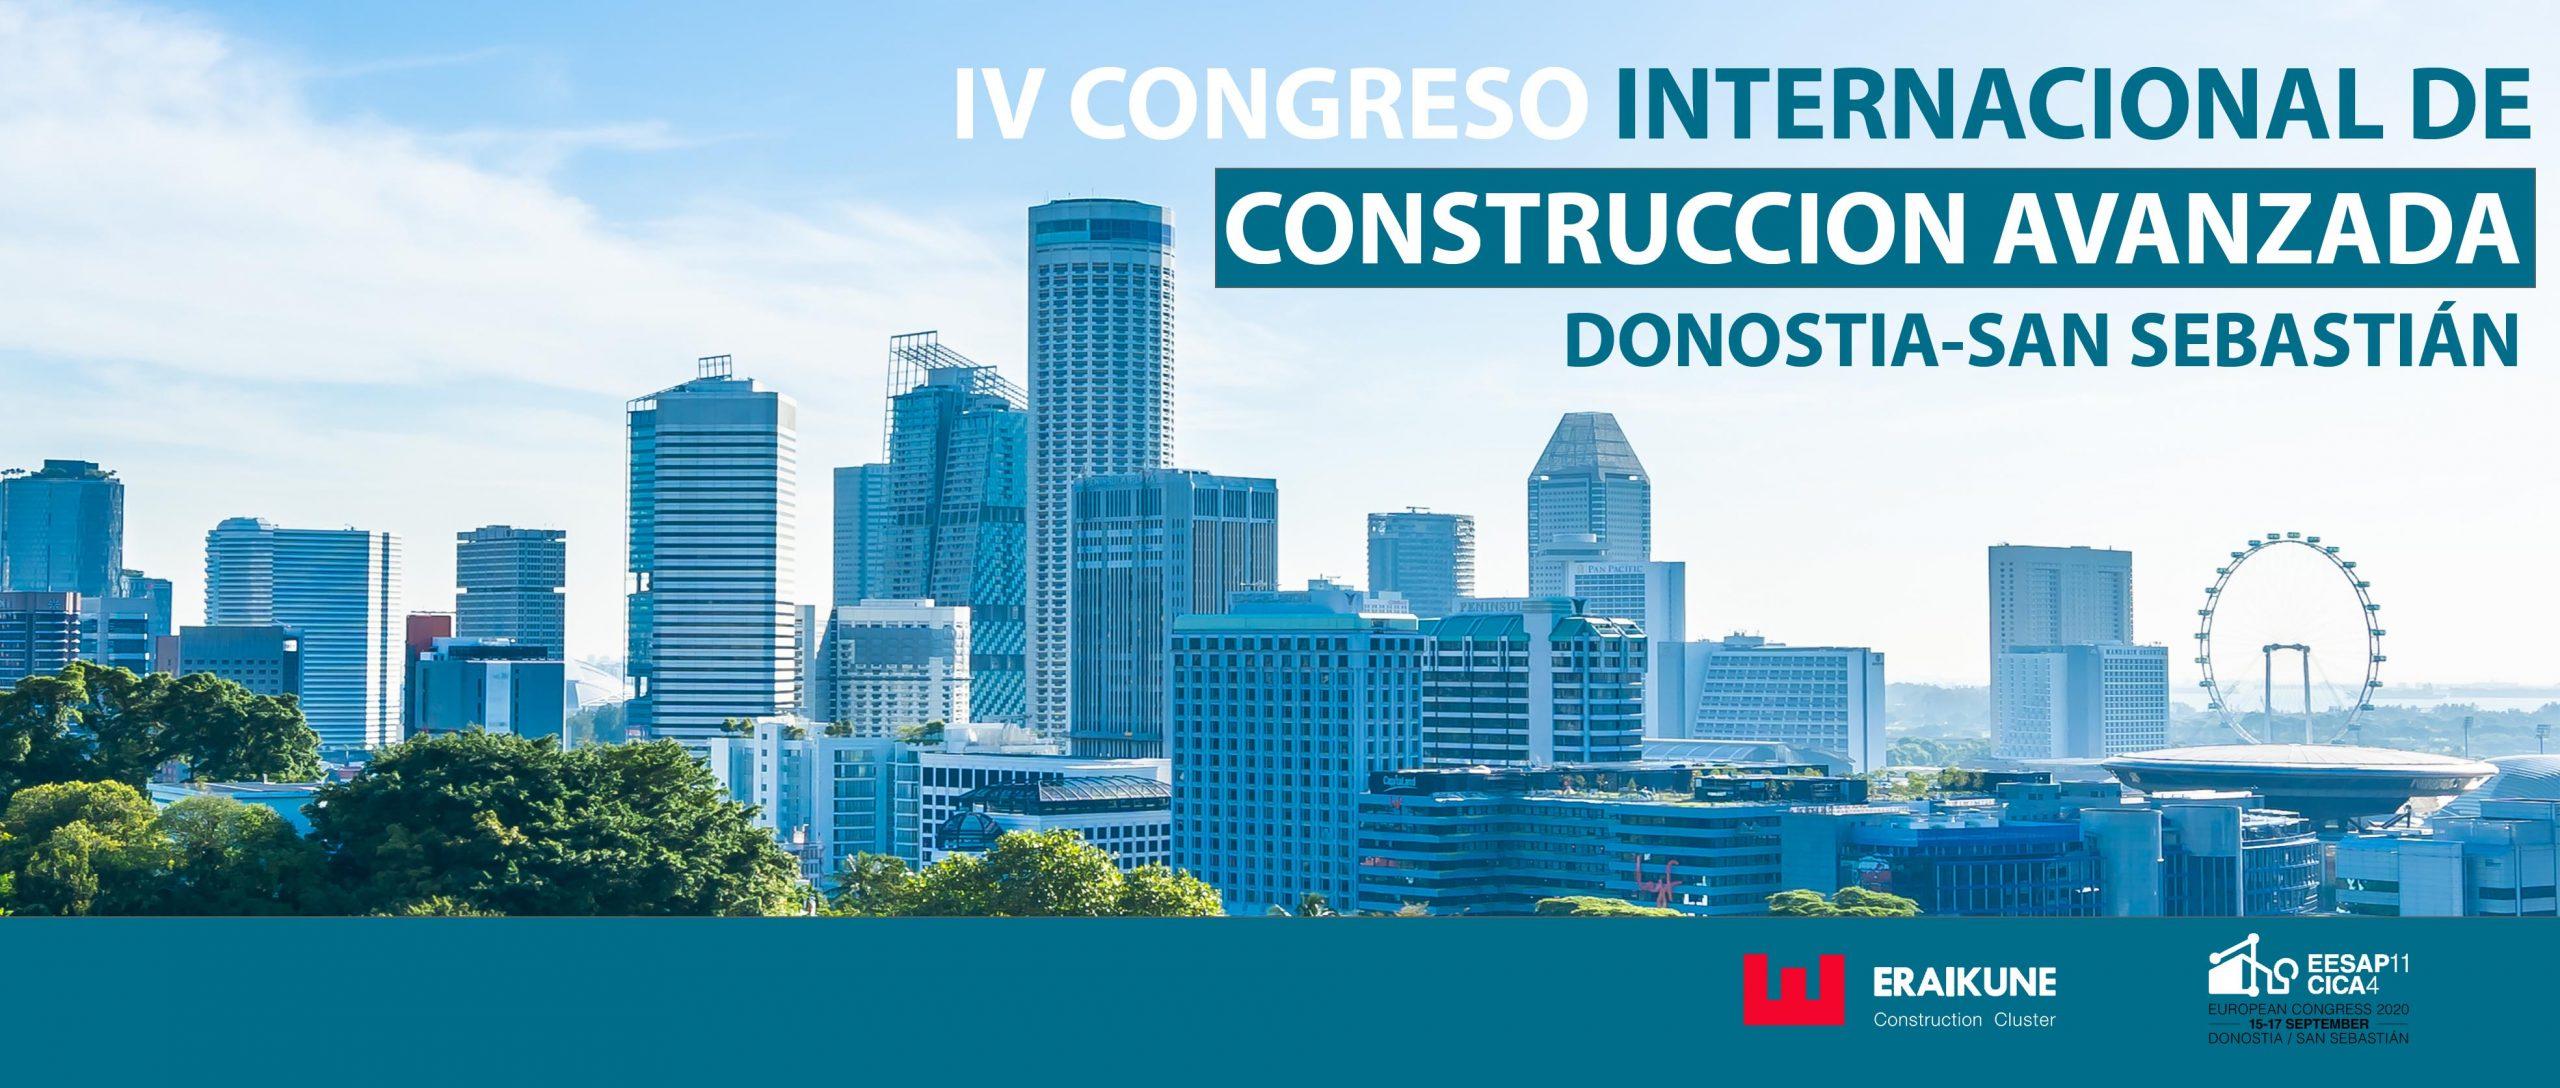 IV Congreso Internacional de Construccion Avanzada - Donostia - San Sebastian